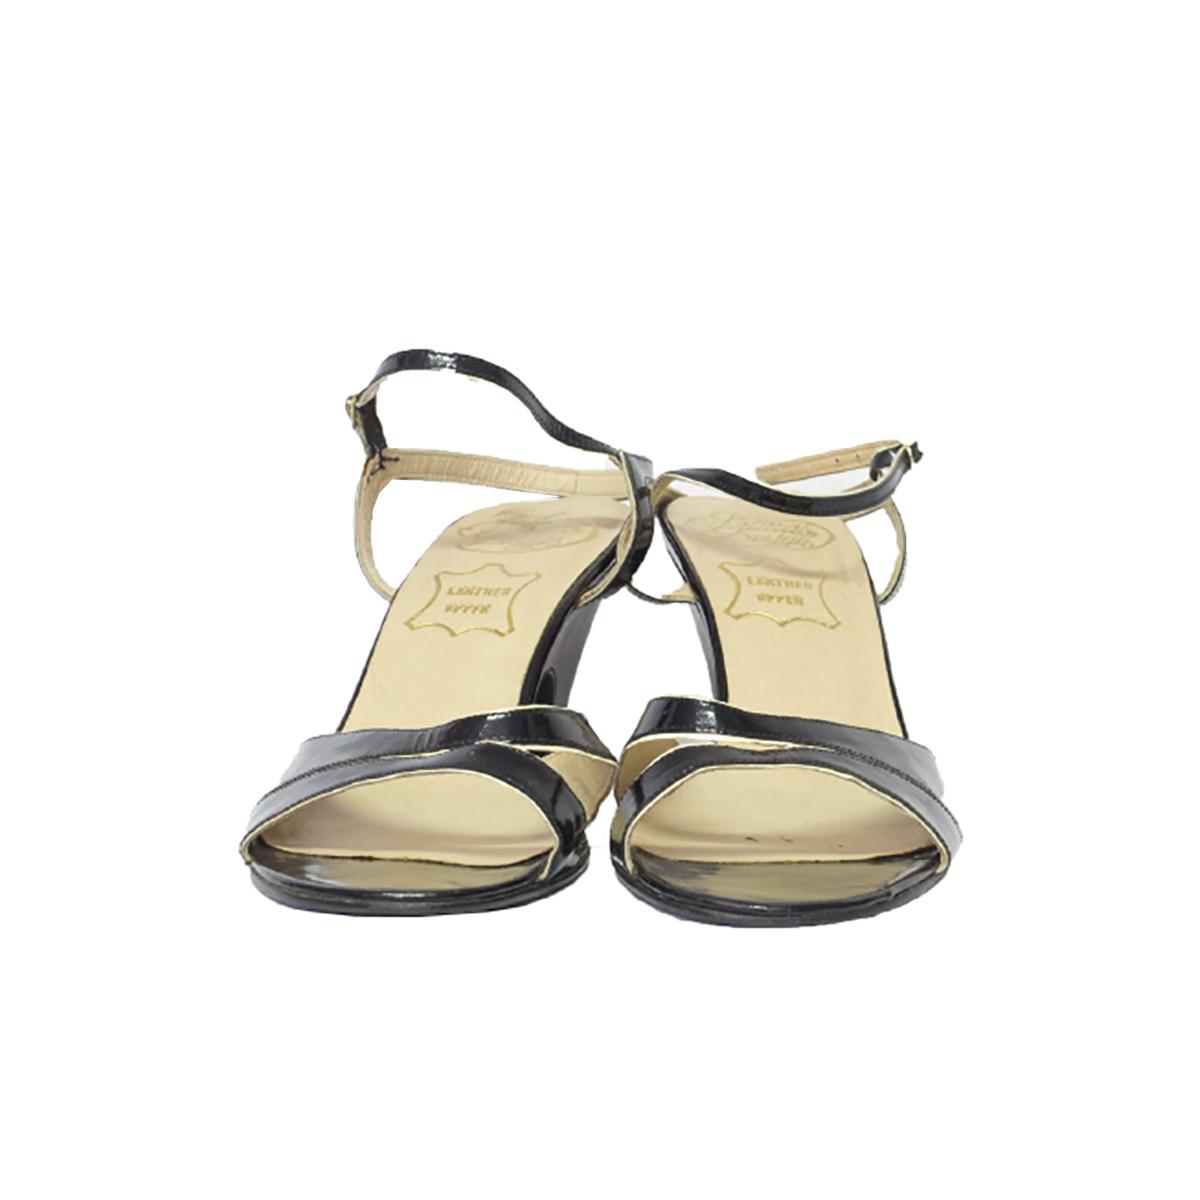 Primas Design, brasilialaiset sandaletit - 40